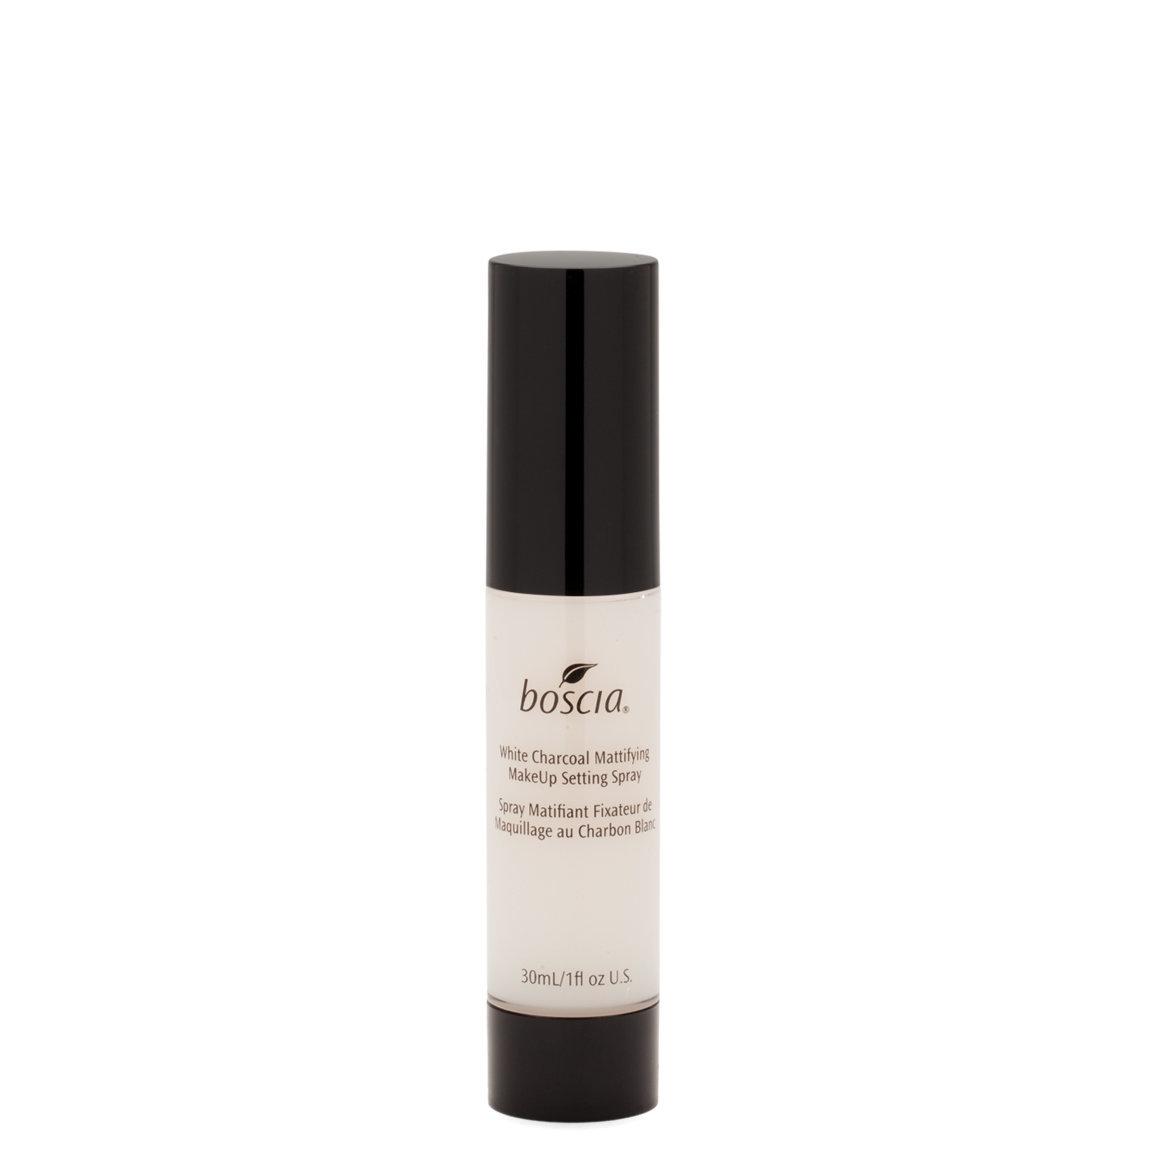 boscia makeup setting spray reviews